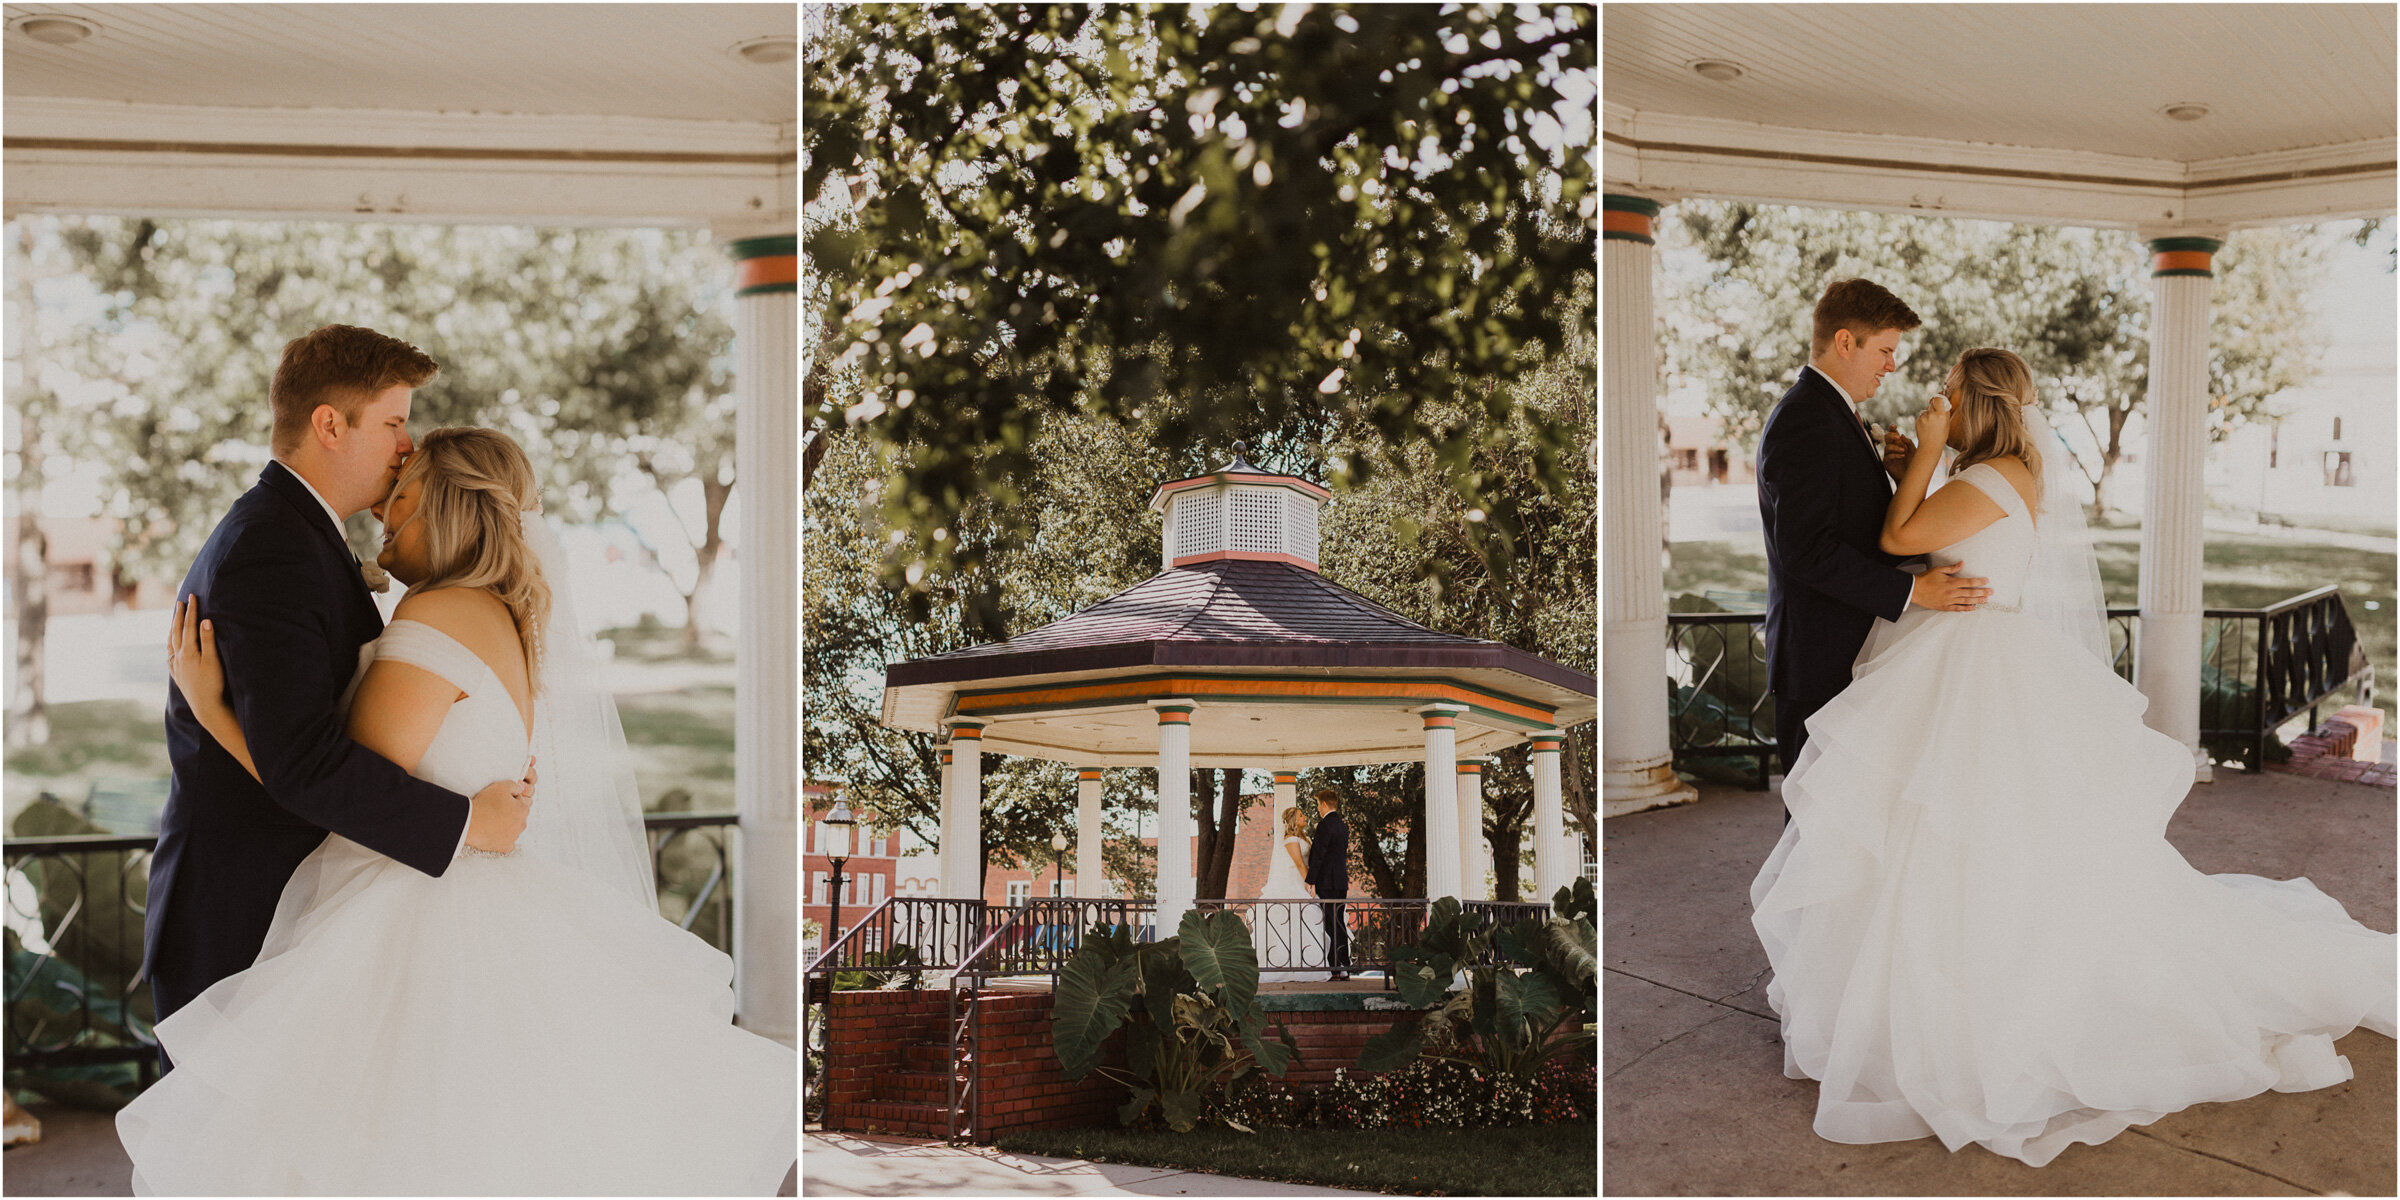 alyssa barletter photography town square paola wedding-10.jpg